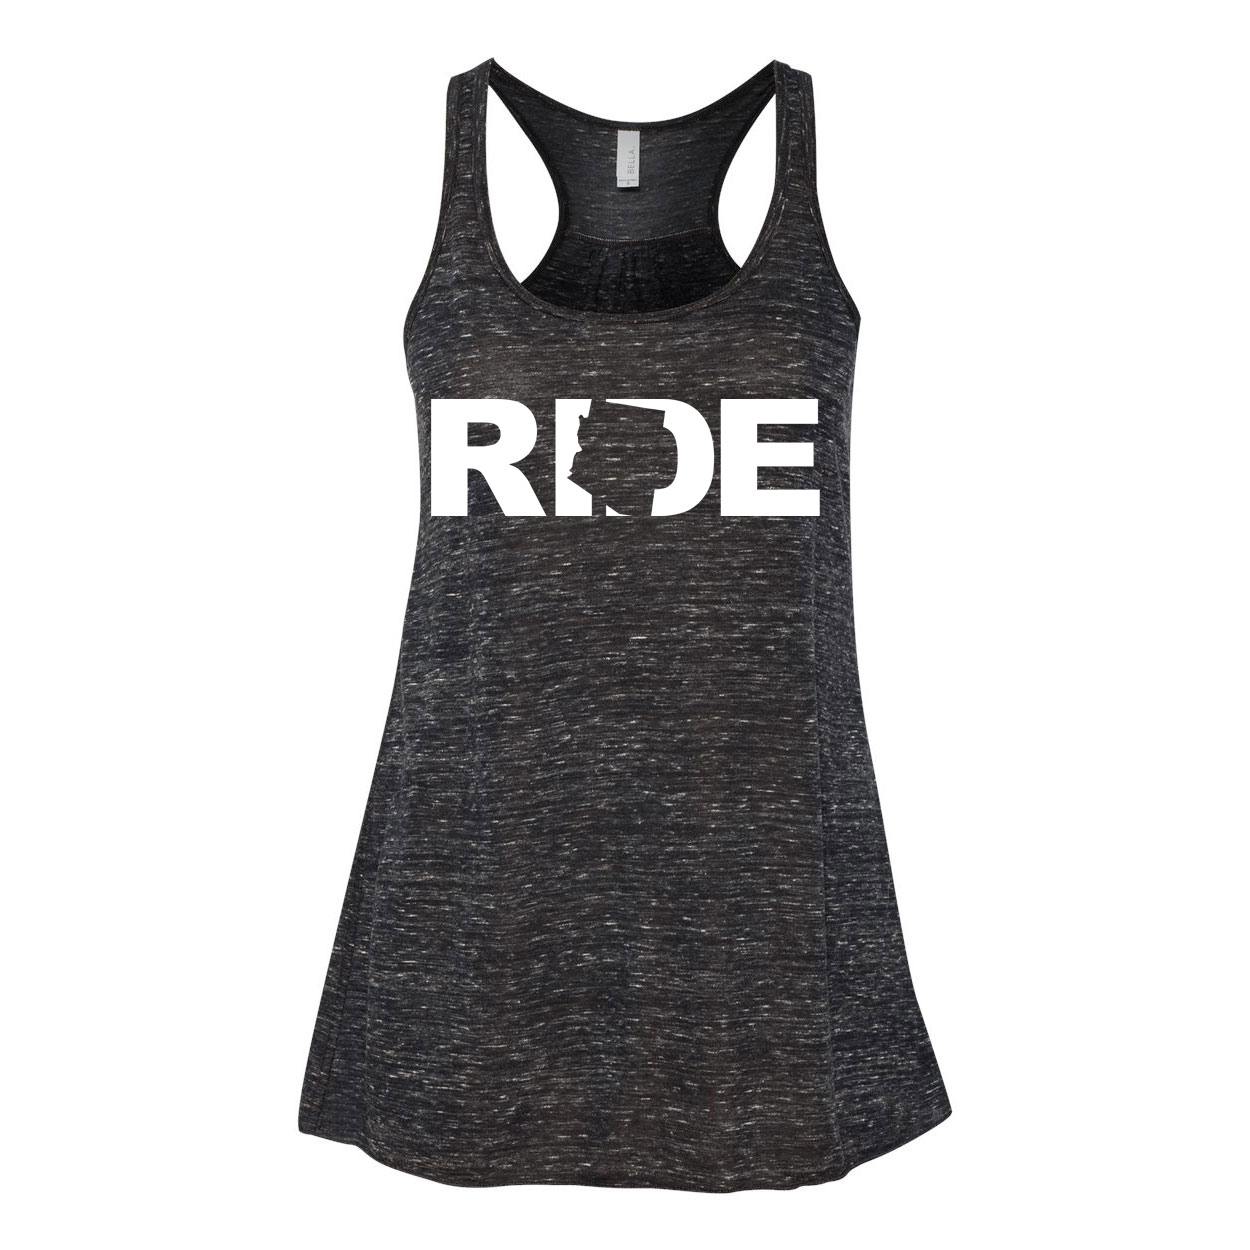 Ride Arizona Classic Women's Flowy Racerback Tank Top Black Marble (White Logo)